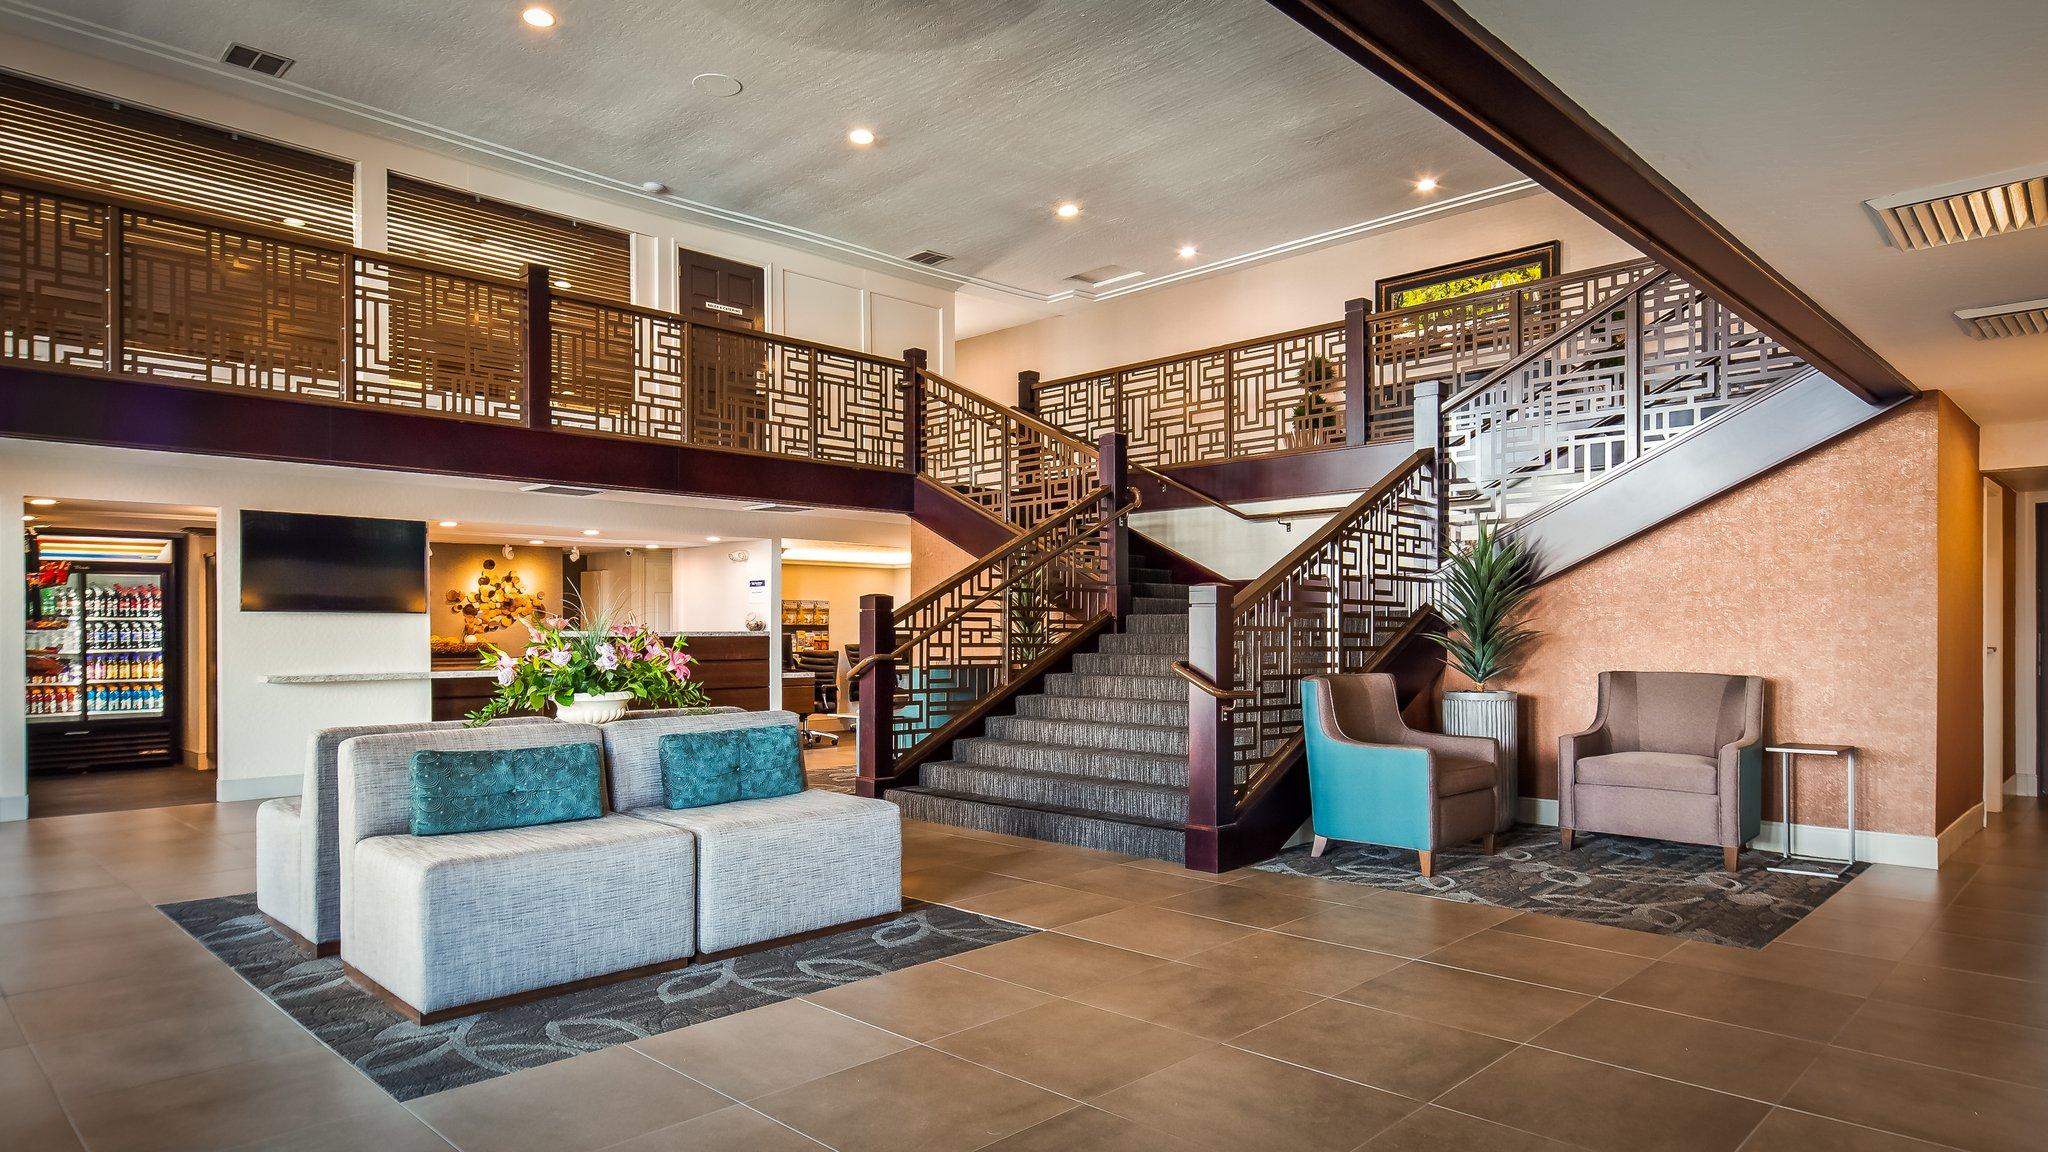 Hotel in Redding California | Best Western Plus Hilltop Inn